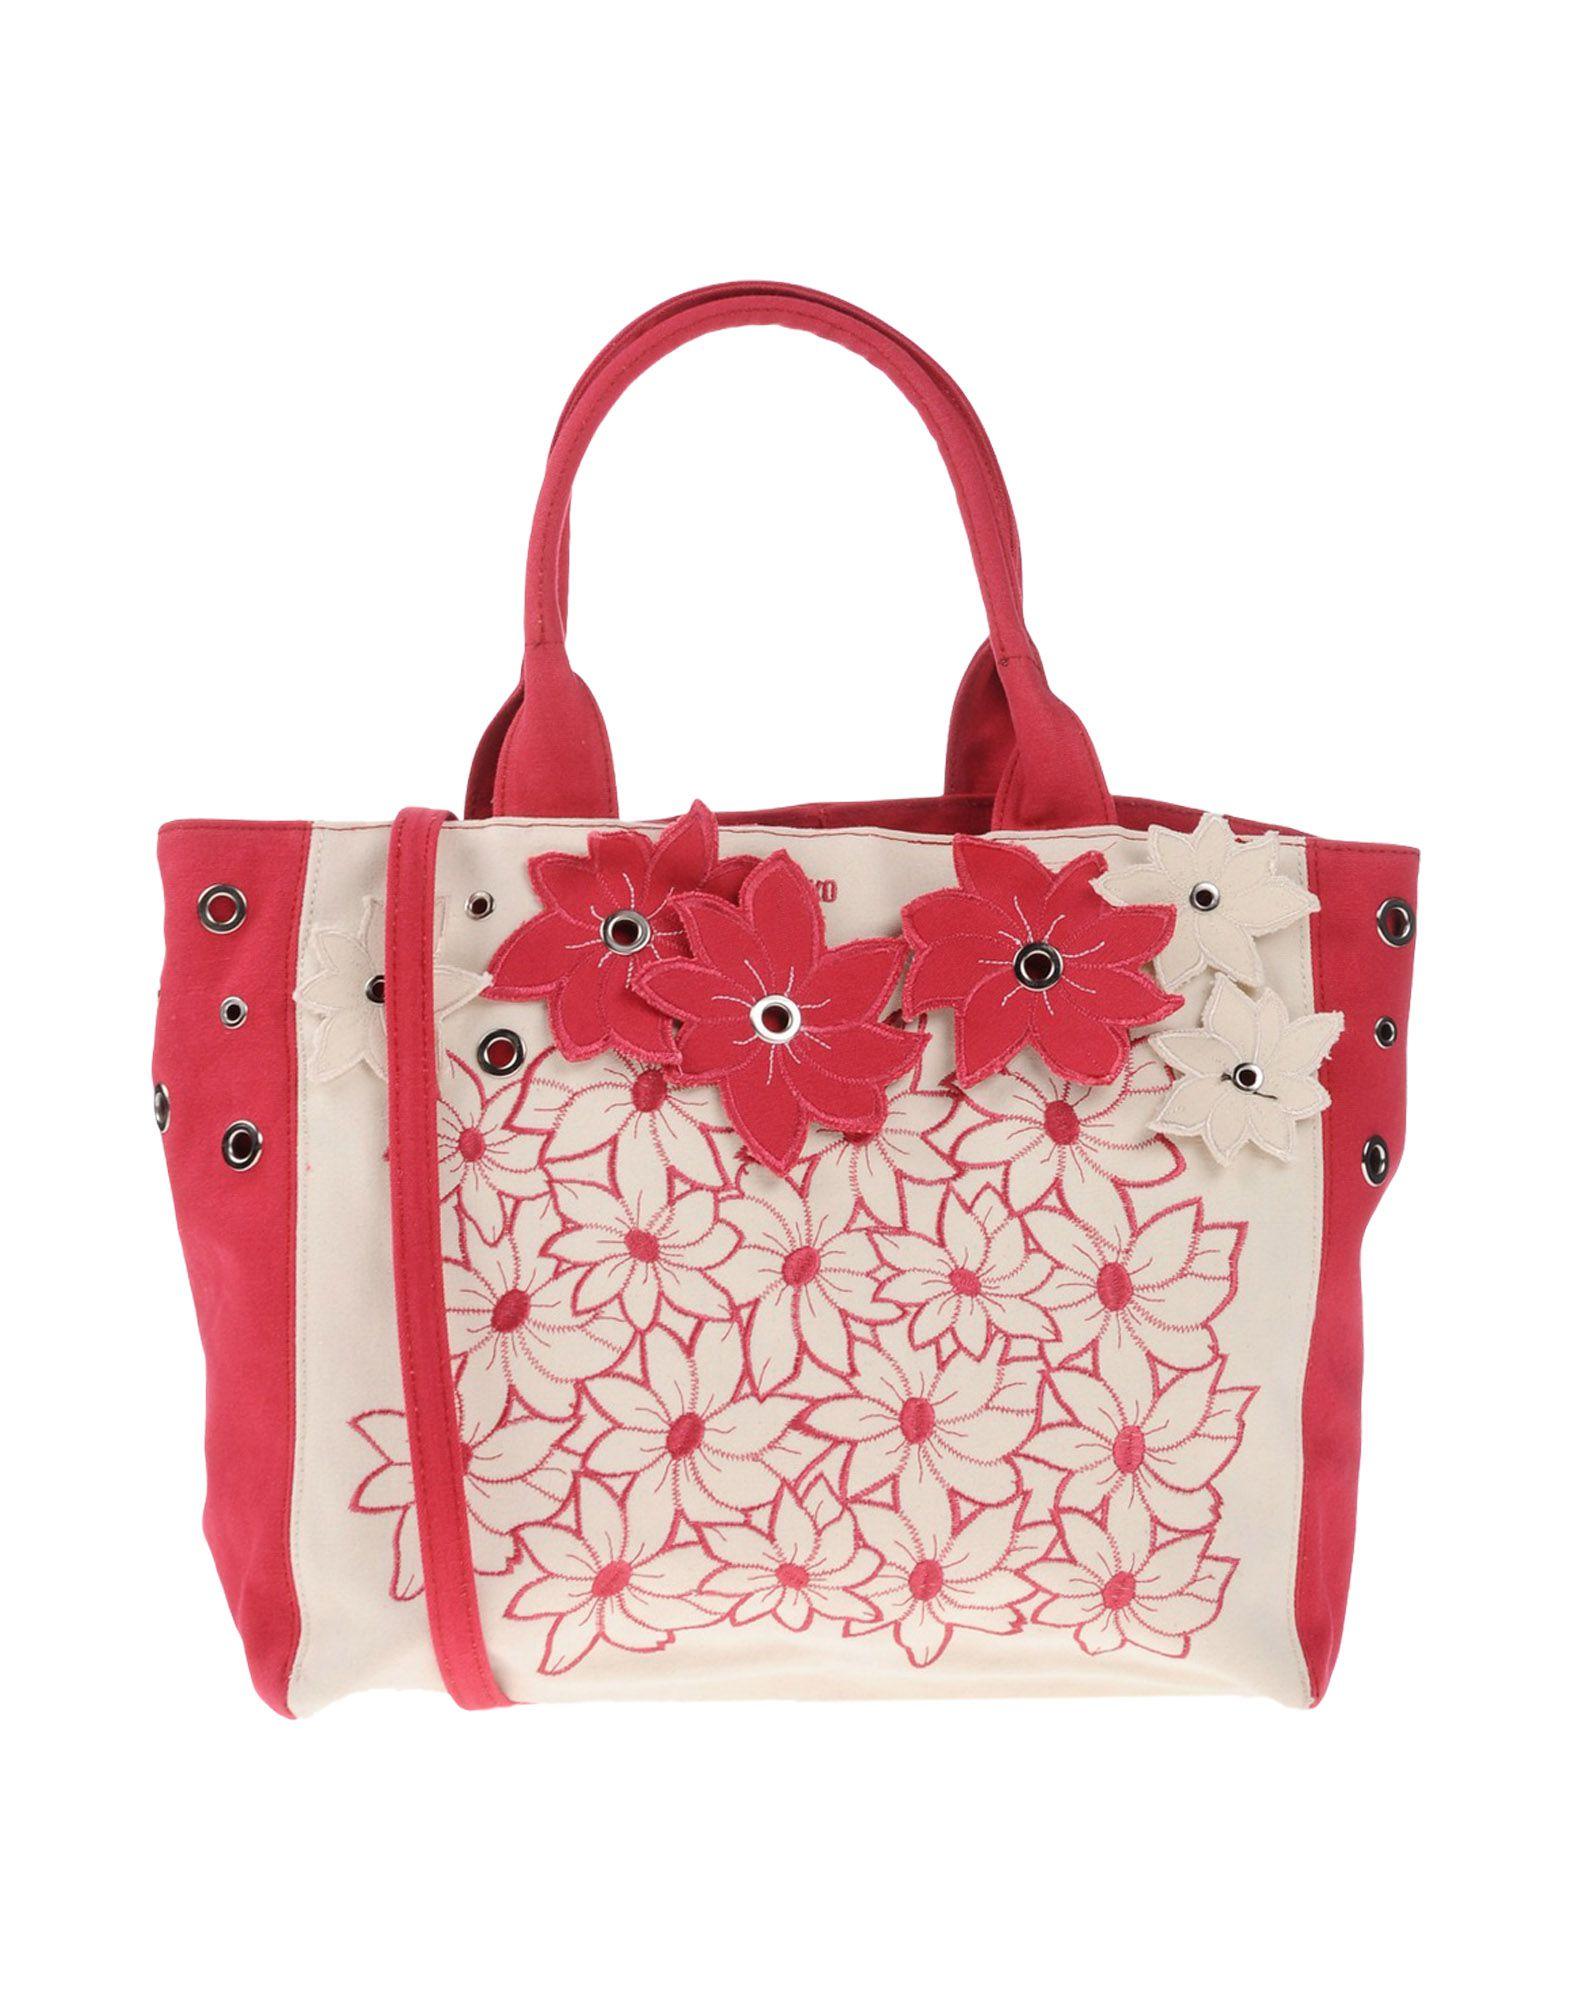 PINKO BAG Сумка на руку makeup organizer travel bag women cosmetic bags summer dumpling clutch women packages waterproof cosmetic bag handbag